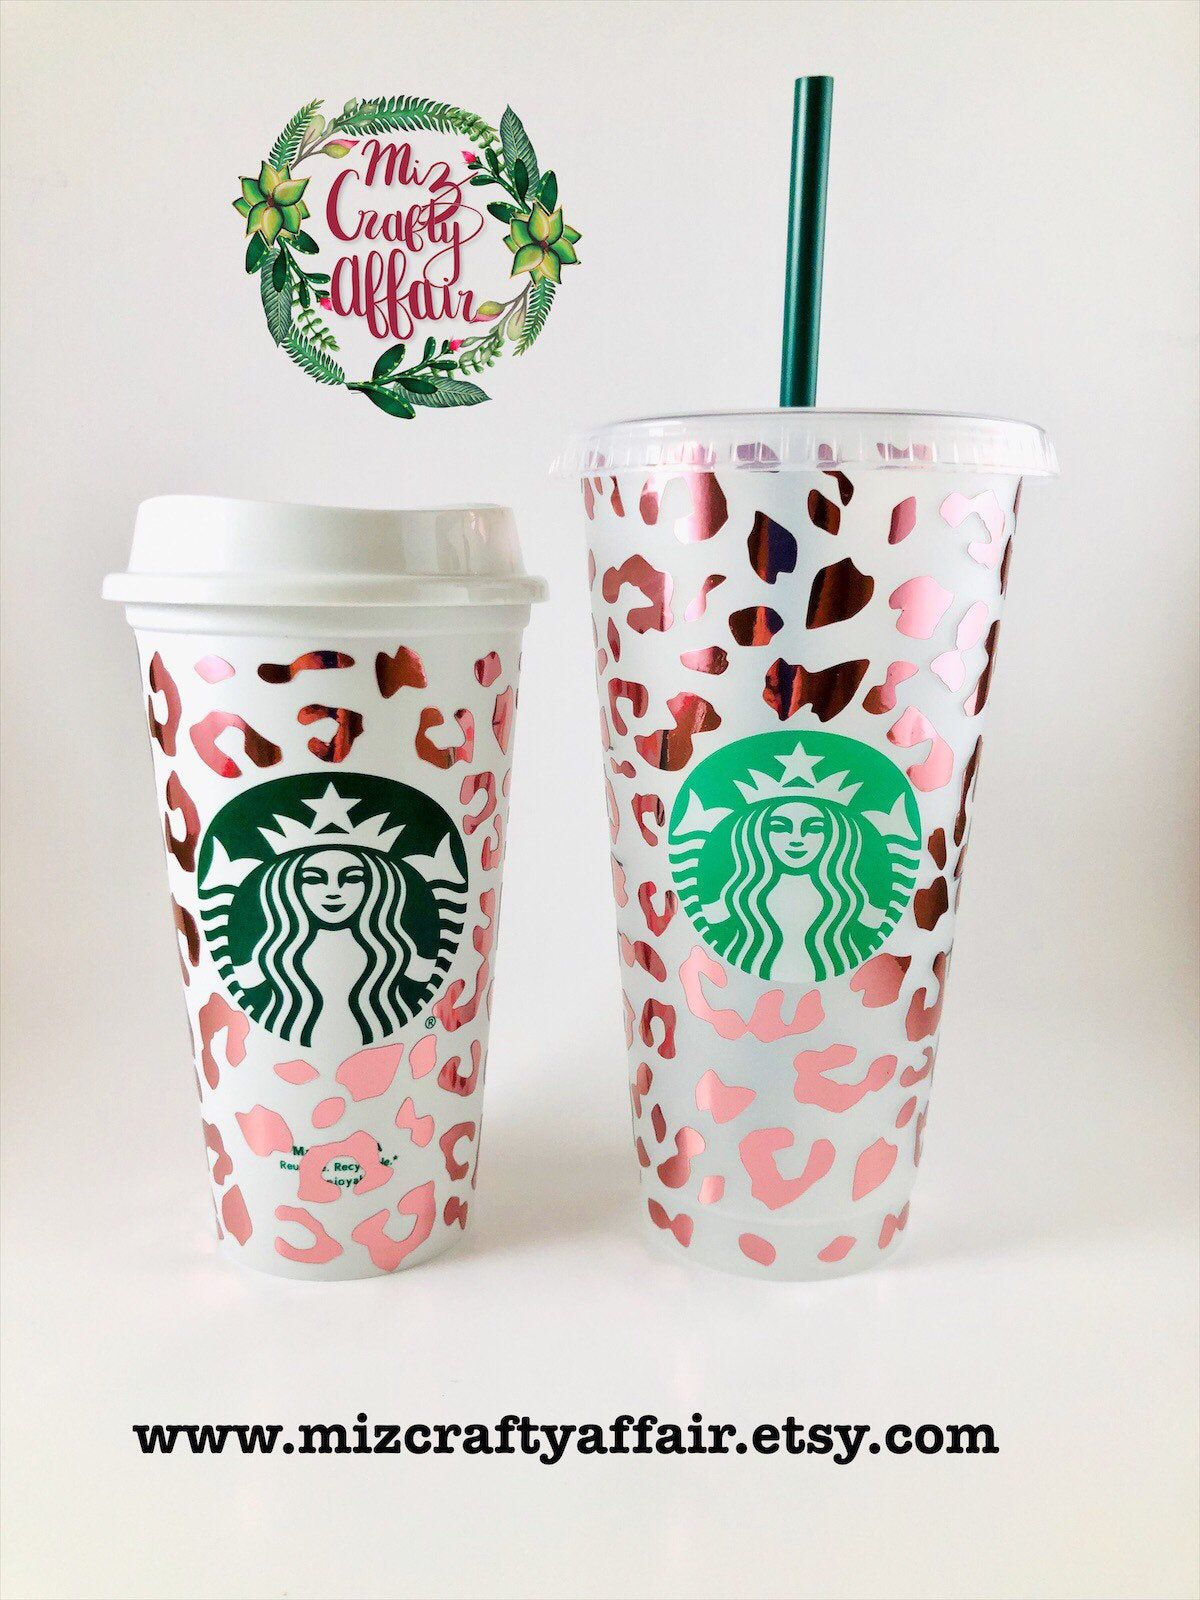 Cheetah Reusable Starbucks Venti Cup Leopard Print Starbucks Etsy In 2020 Custom Starbucks Cup Personalized Starbucks Cup Starbucks Venti